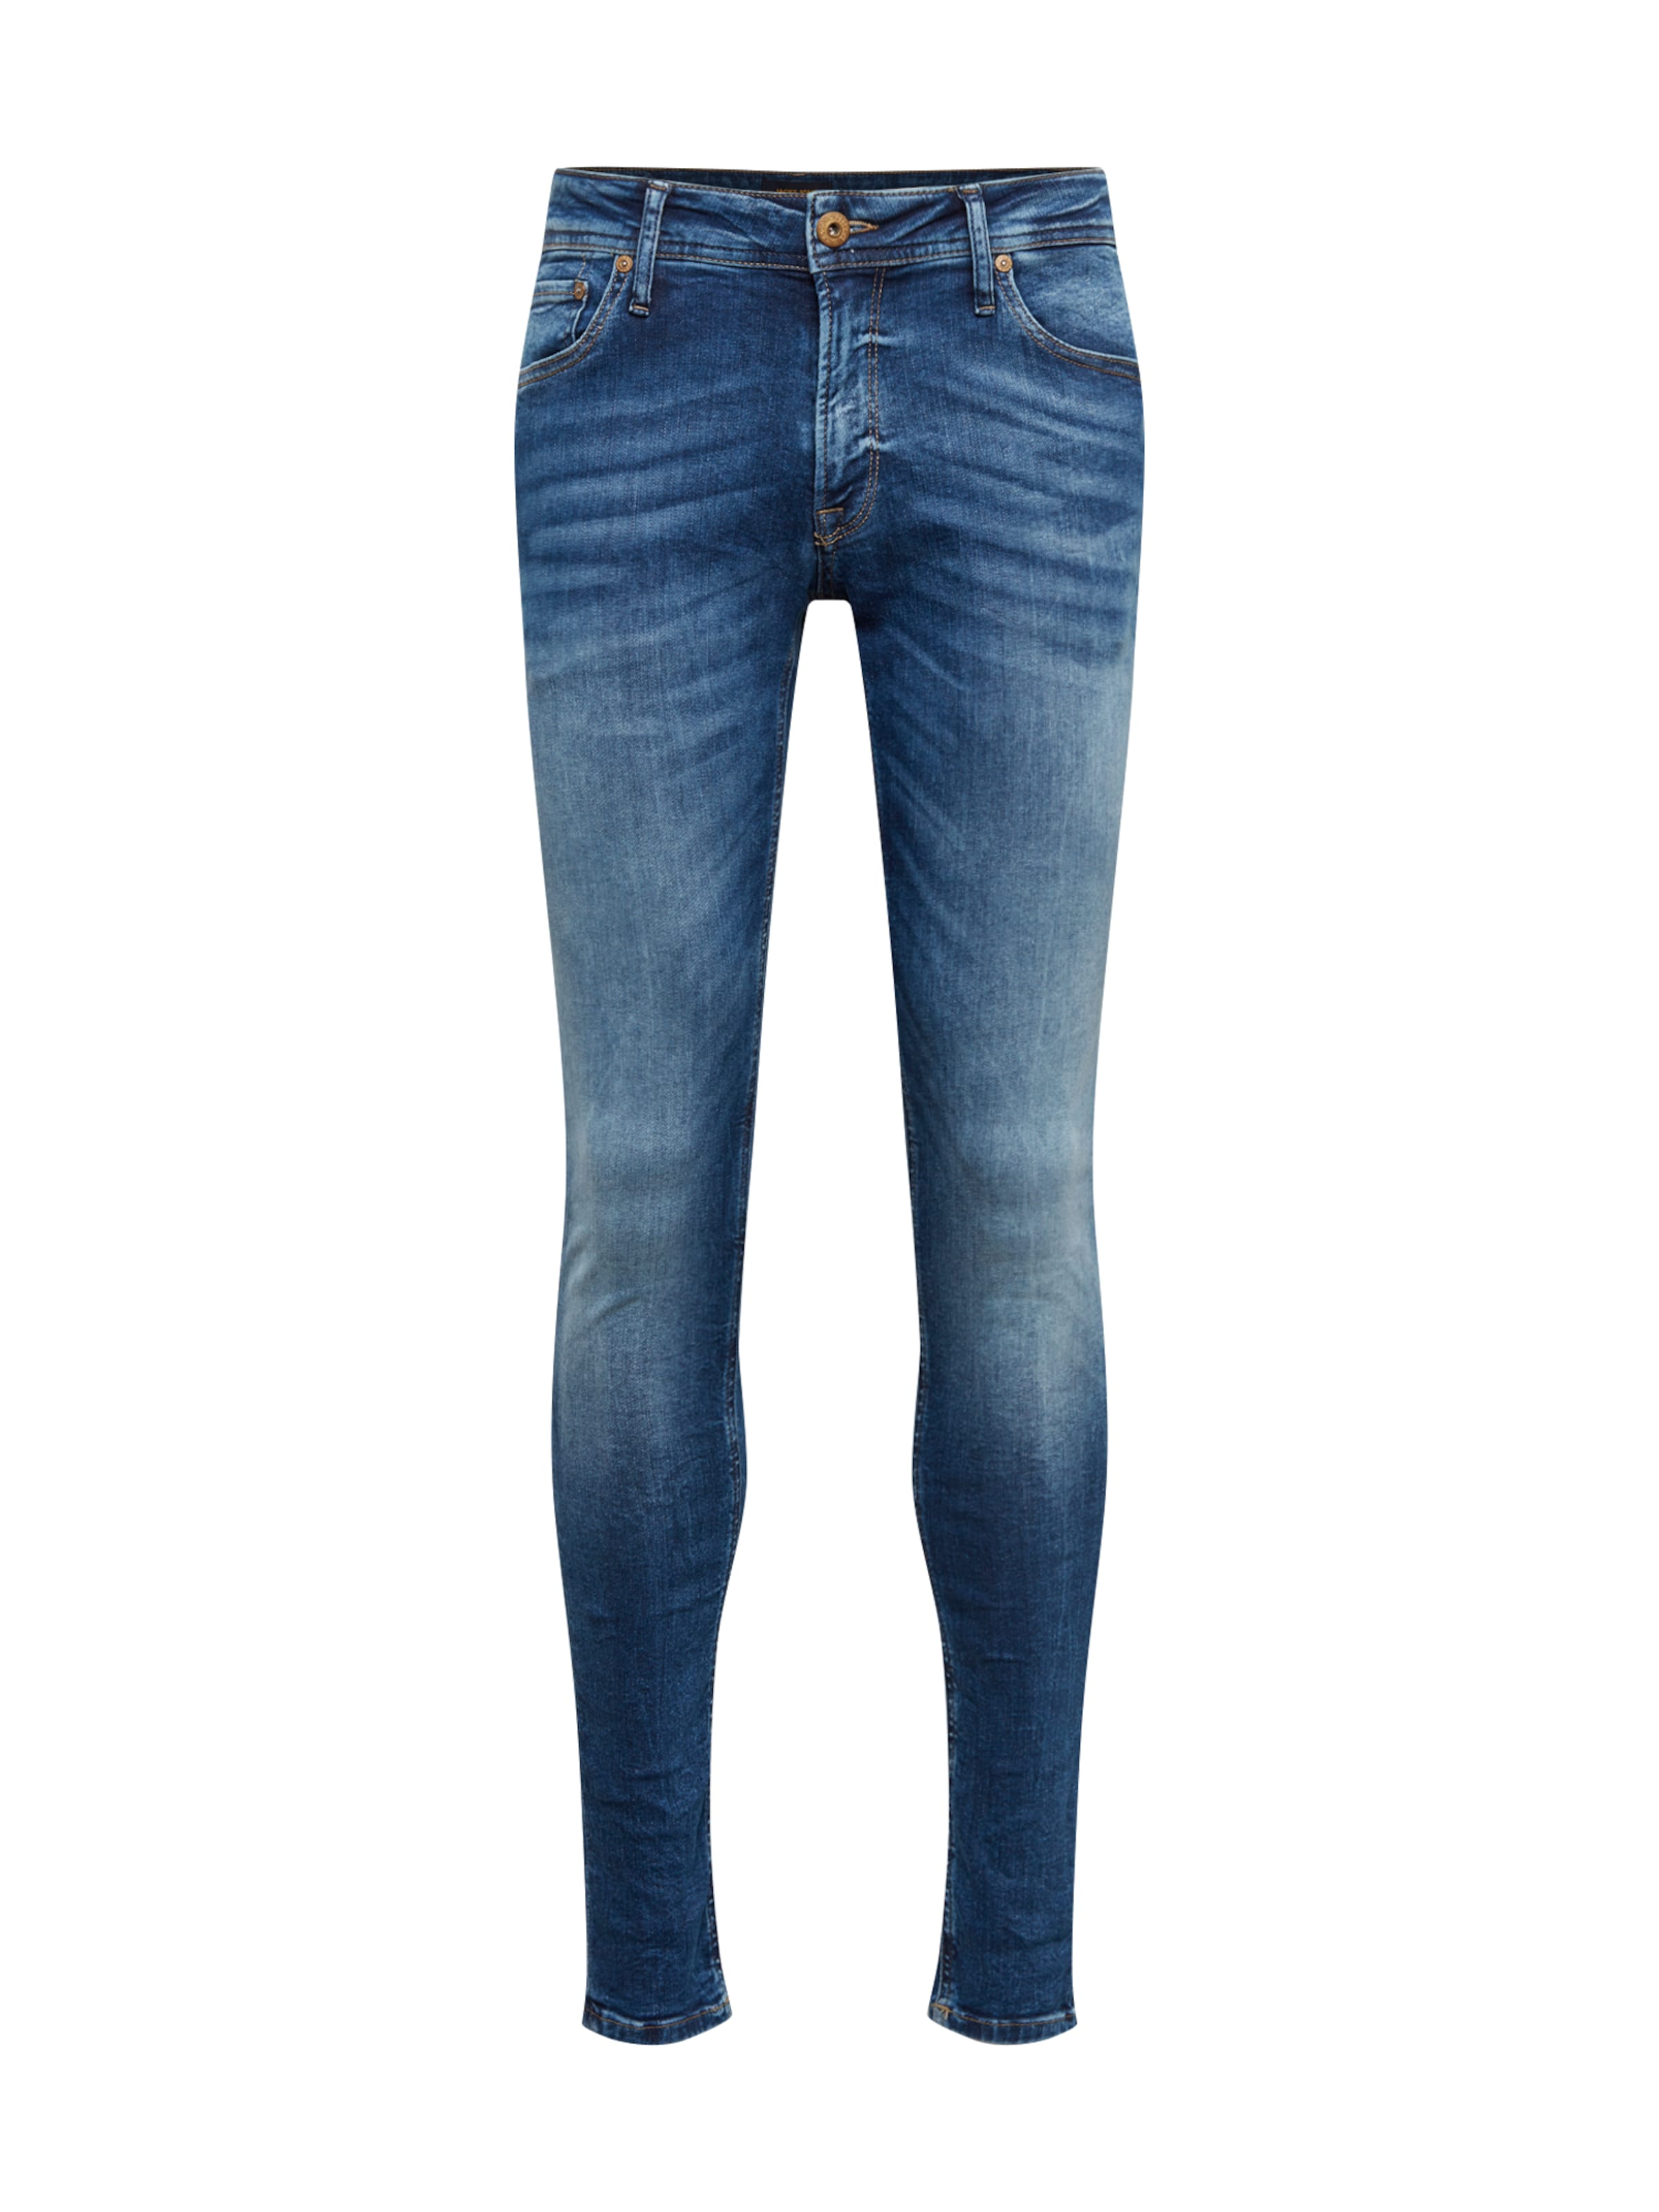 Jeans In 50sps Jones Denim 'tom Jackamp; Jos Blue Original Noos' 510 K1Jc3lFT